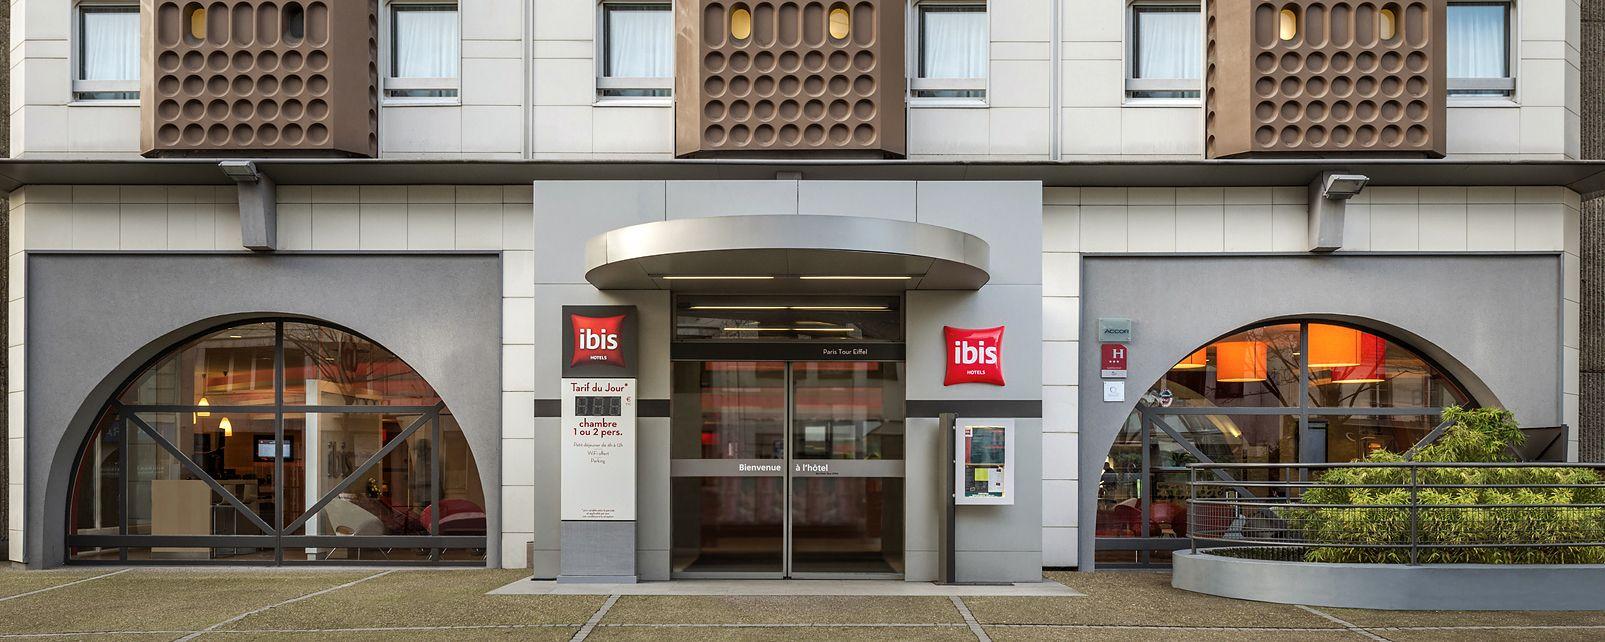 Ibis Hotel Cambronne Paris